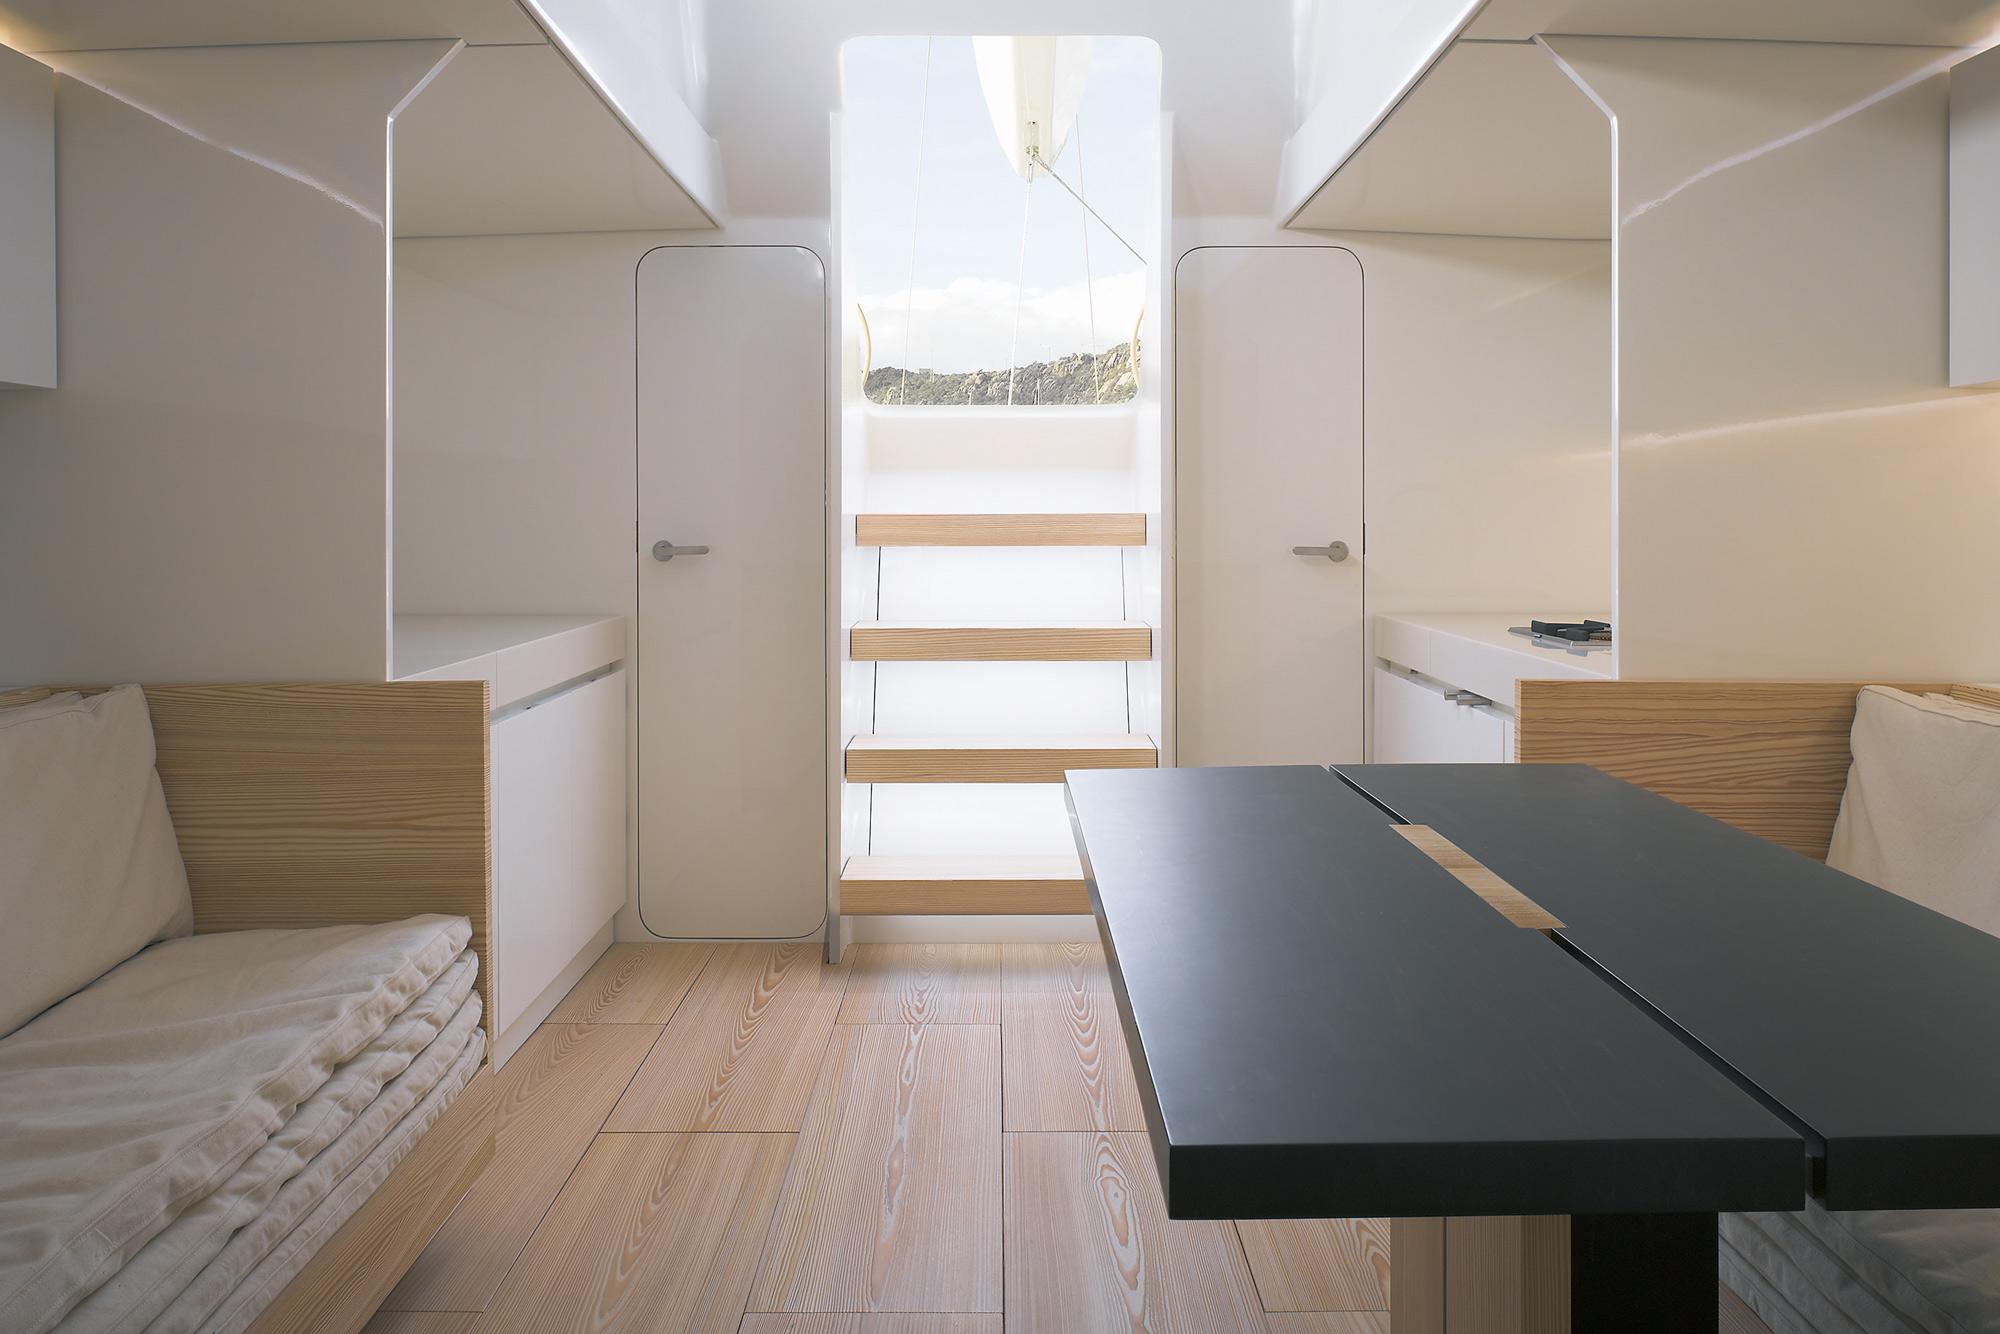 John pawson b60 sloop for Interior design kiel